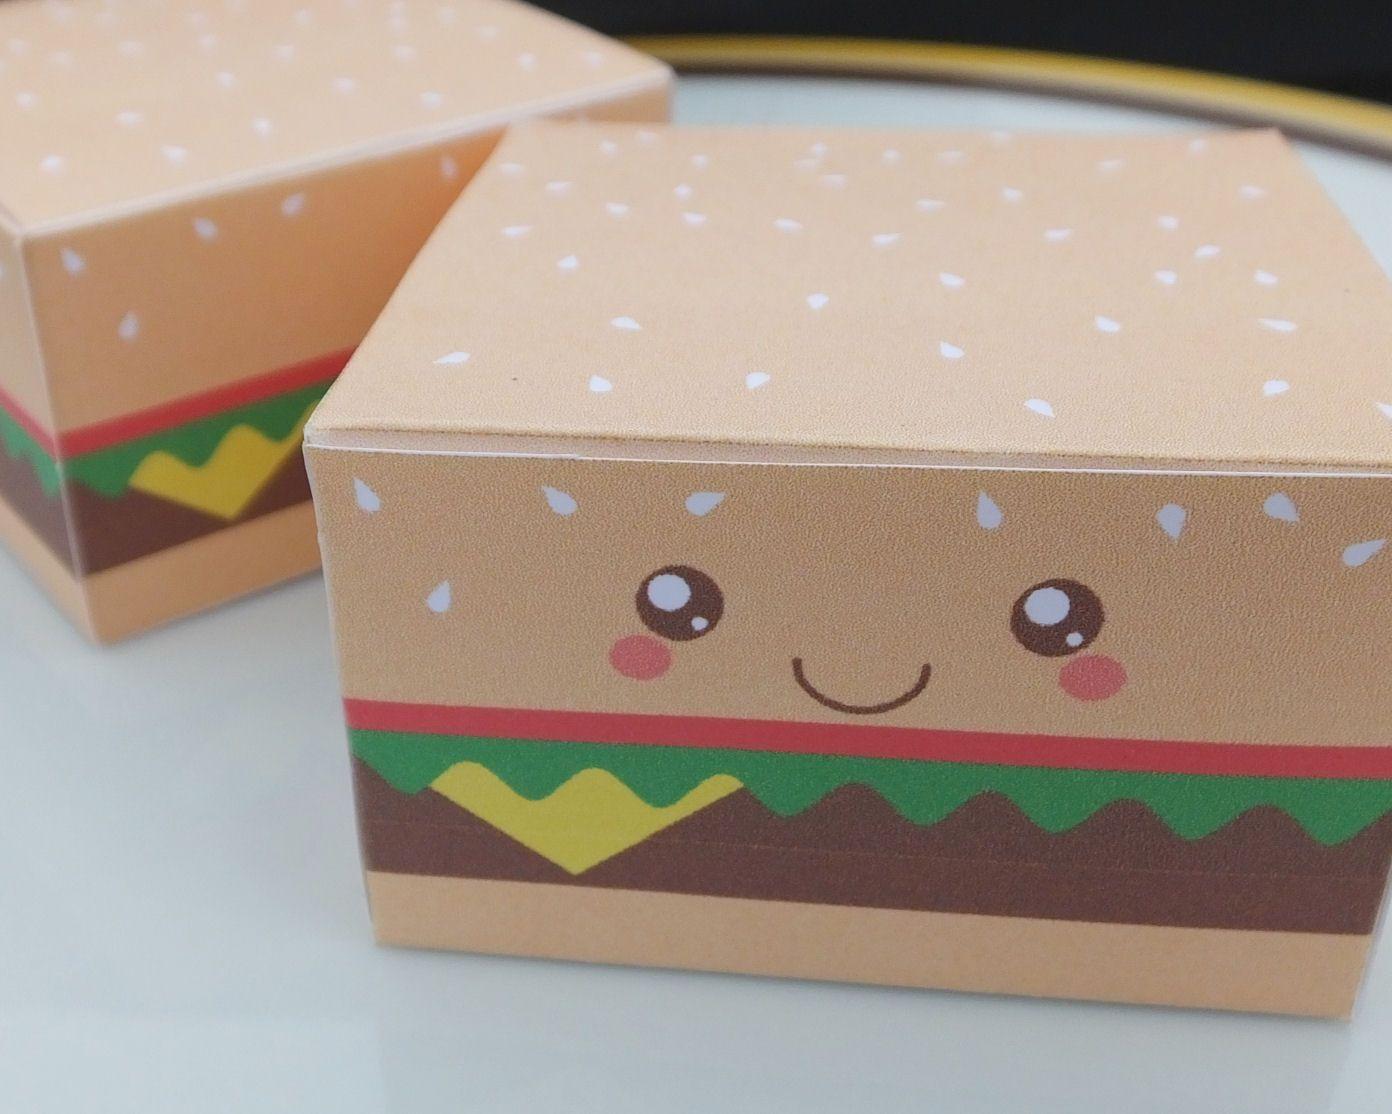 Printable cheeseburger gift boxes   My Creations ...